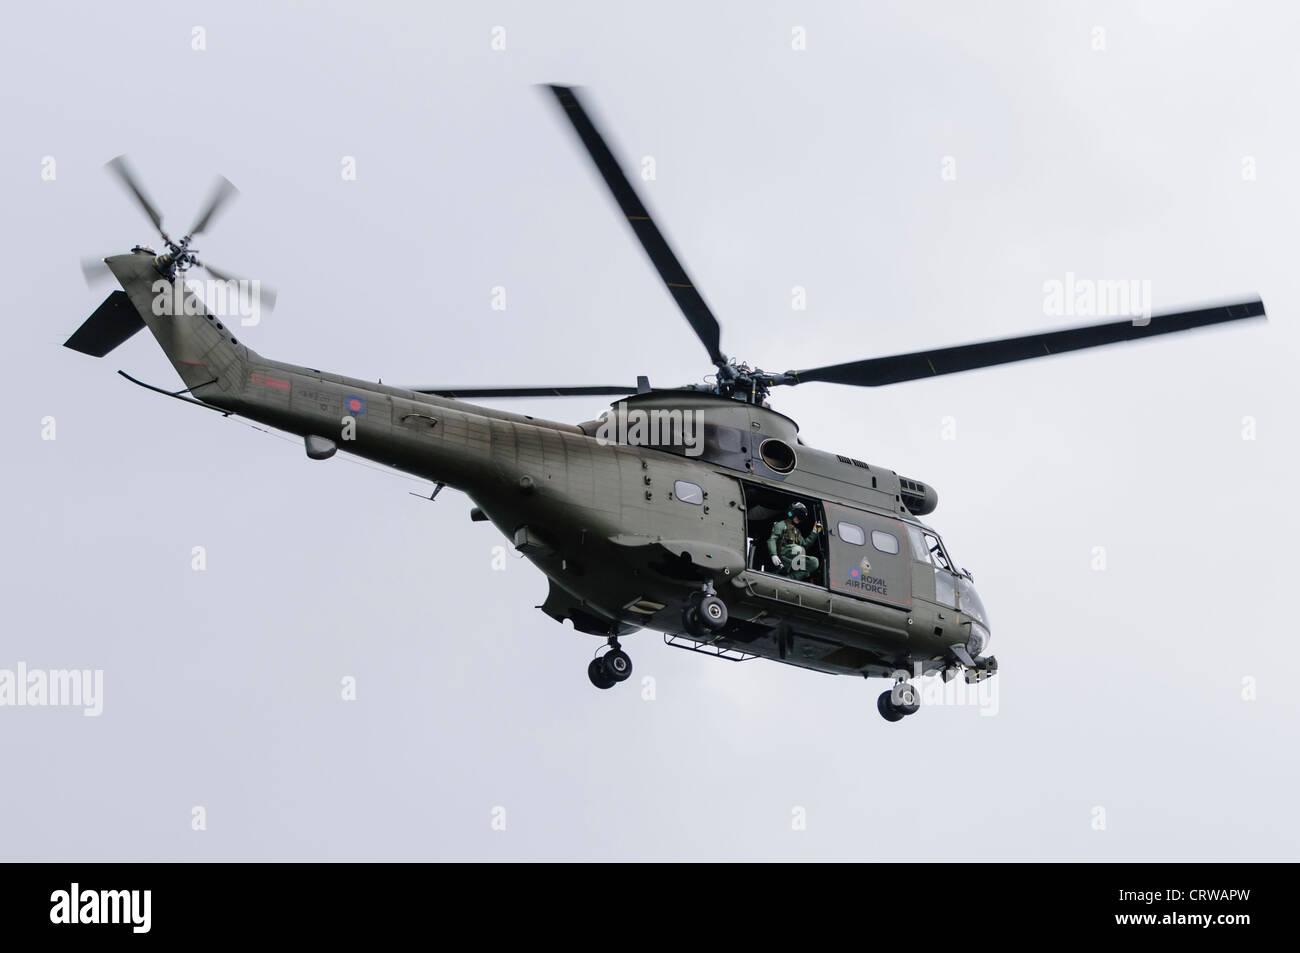 Royal Air Force Puma in flight - Stock Image